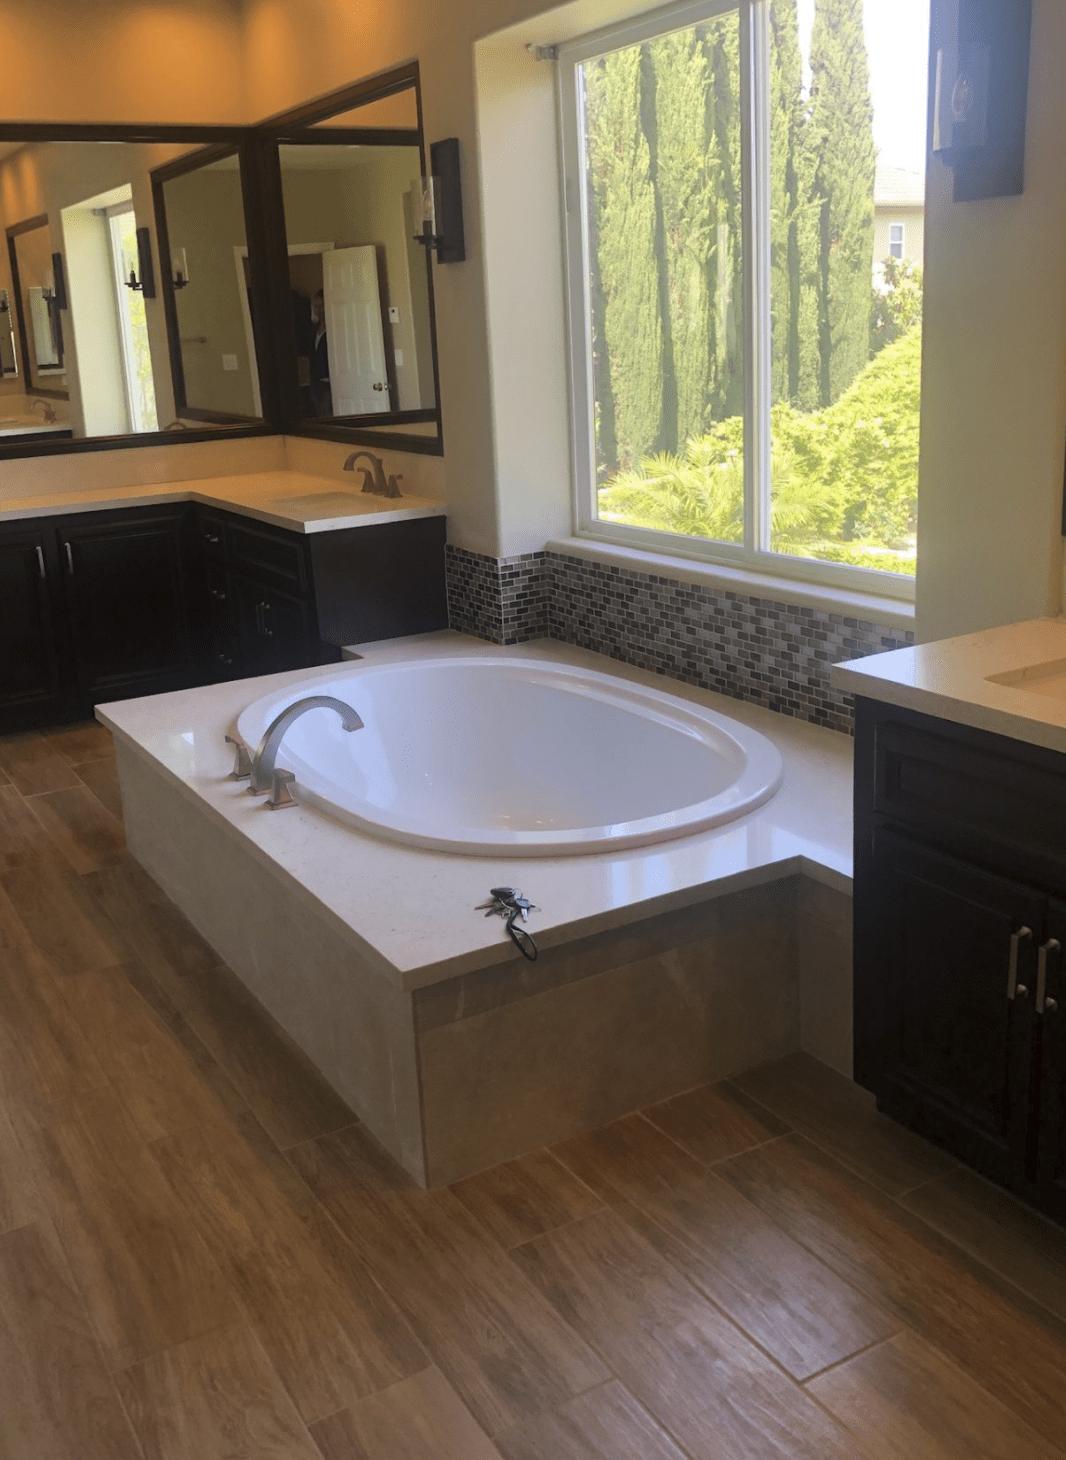 Gorgeous soaking tub in Anaheim, CA from TS Home Design Center / Rite Loom Flooring